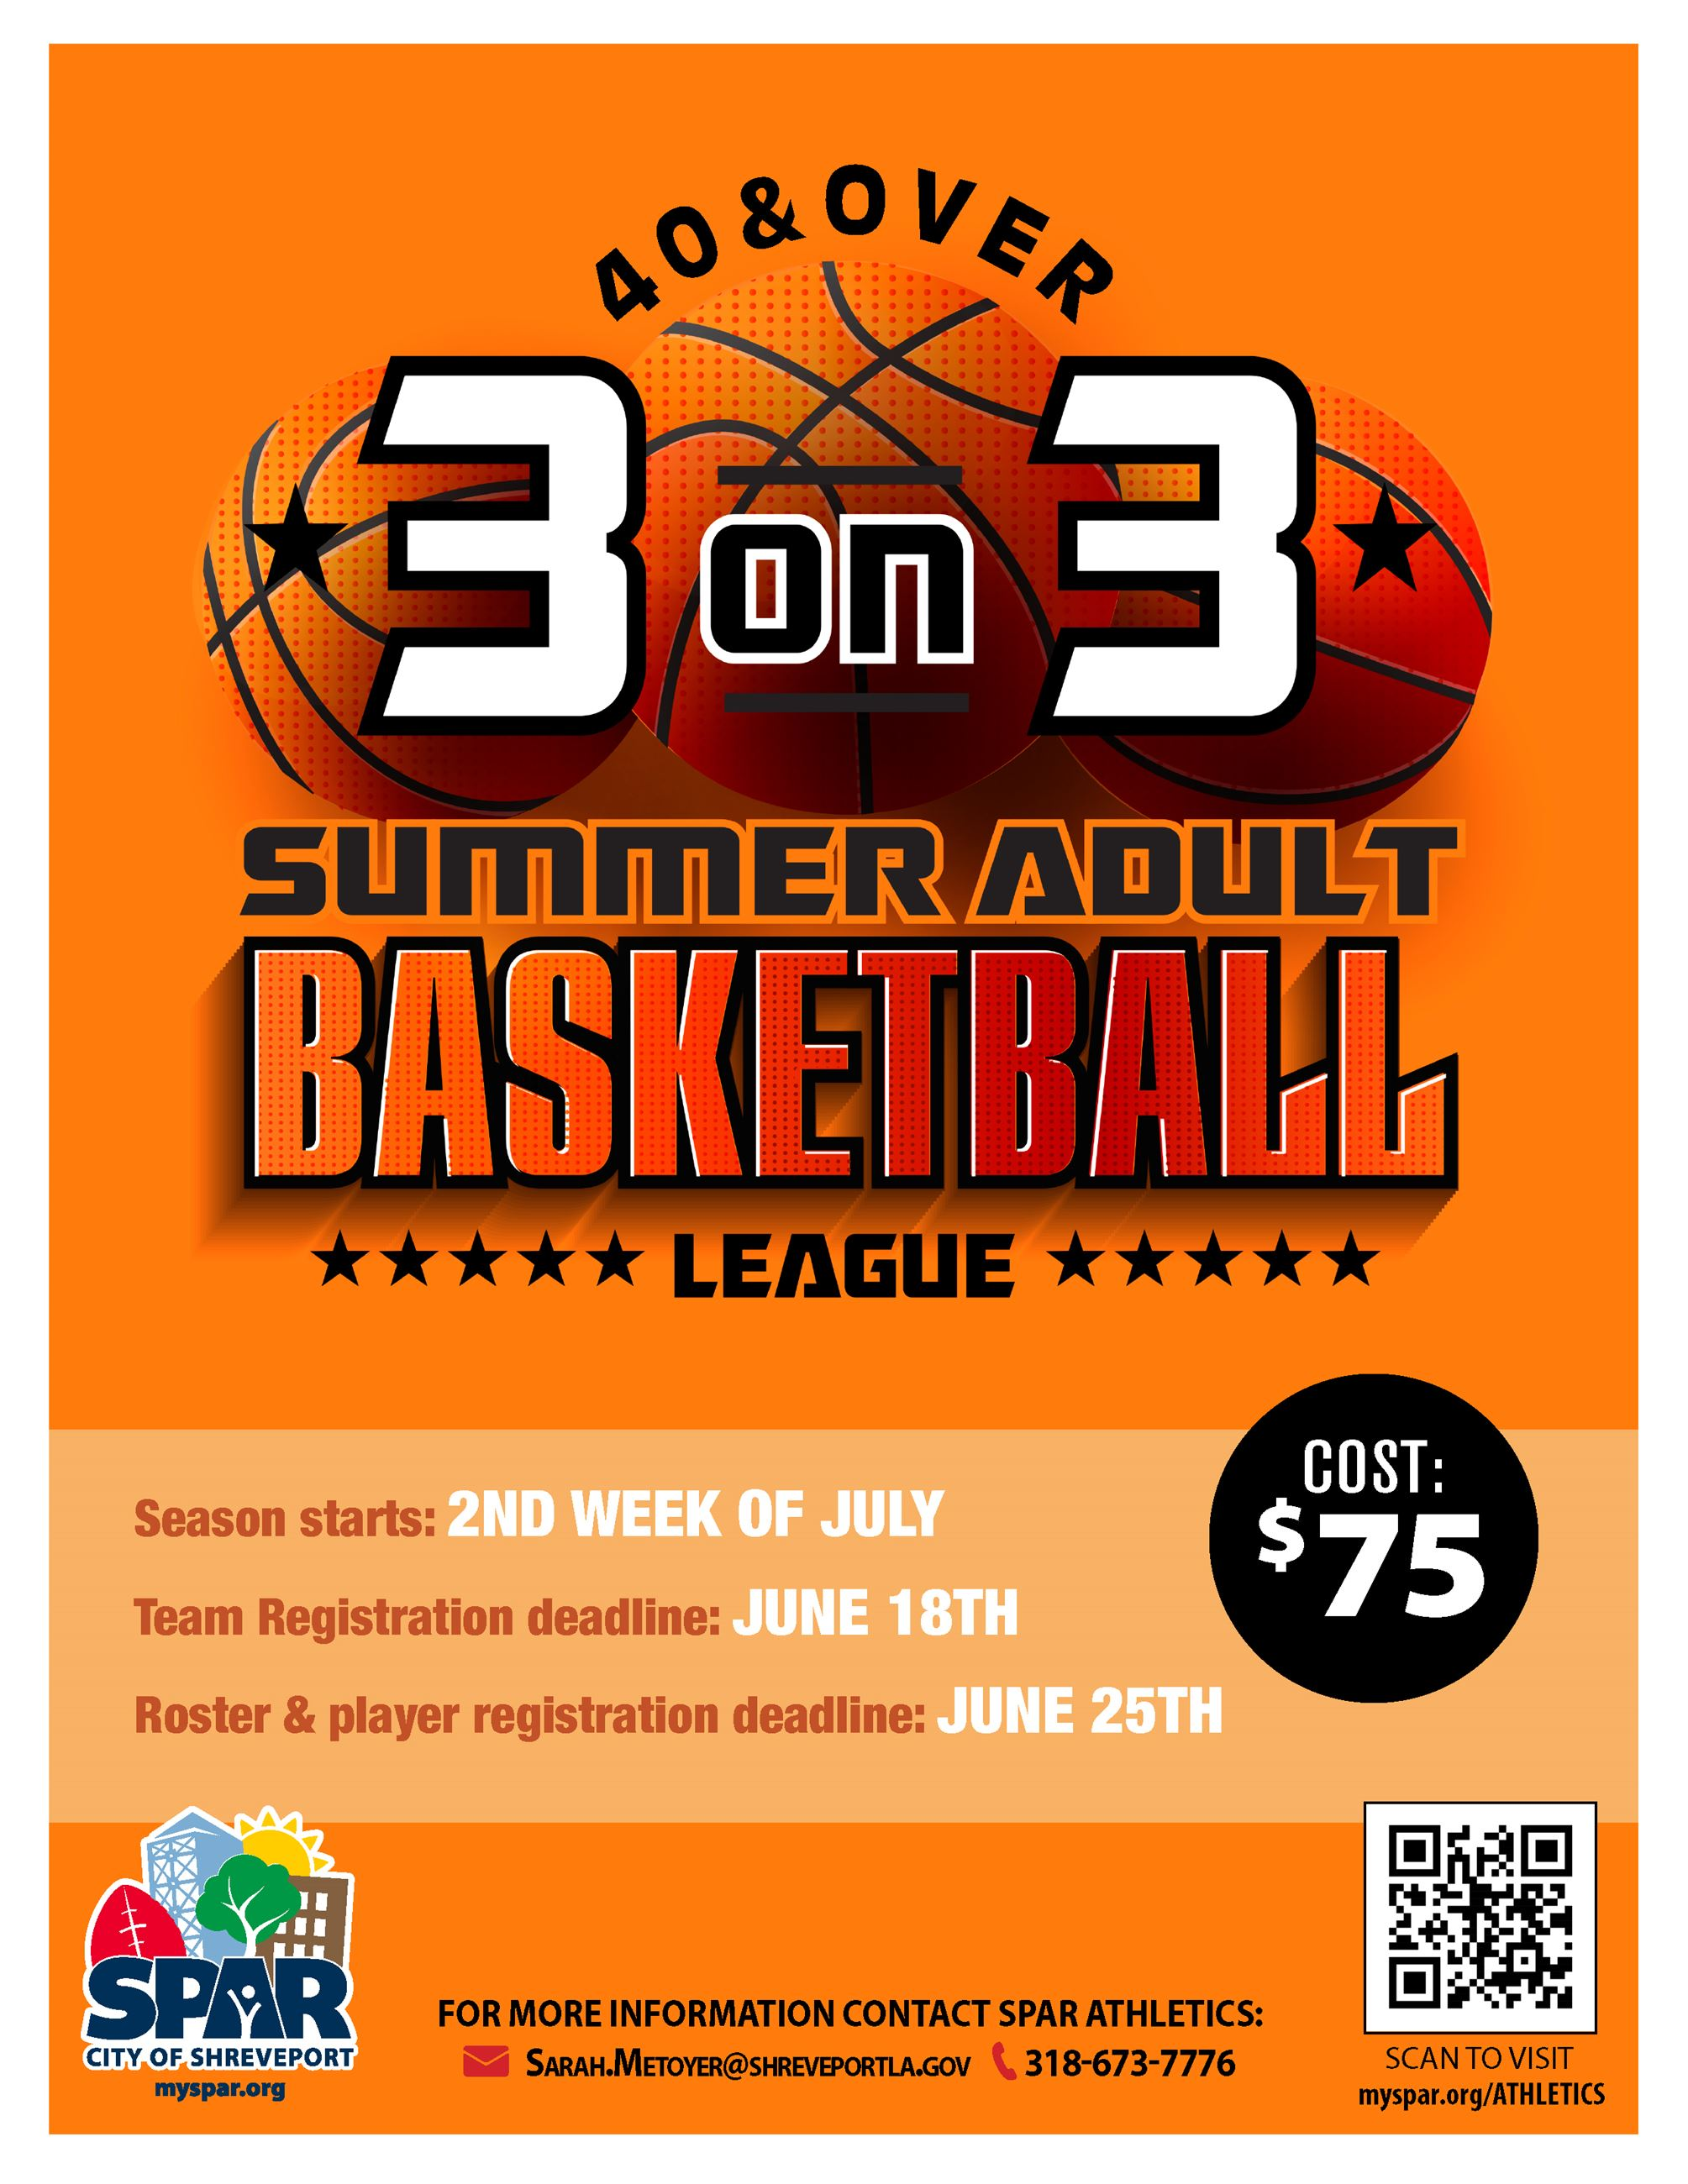 2021 3on3 Summer Adult Basketball